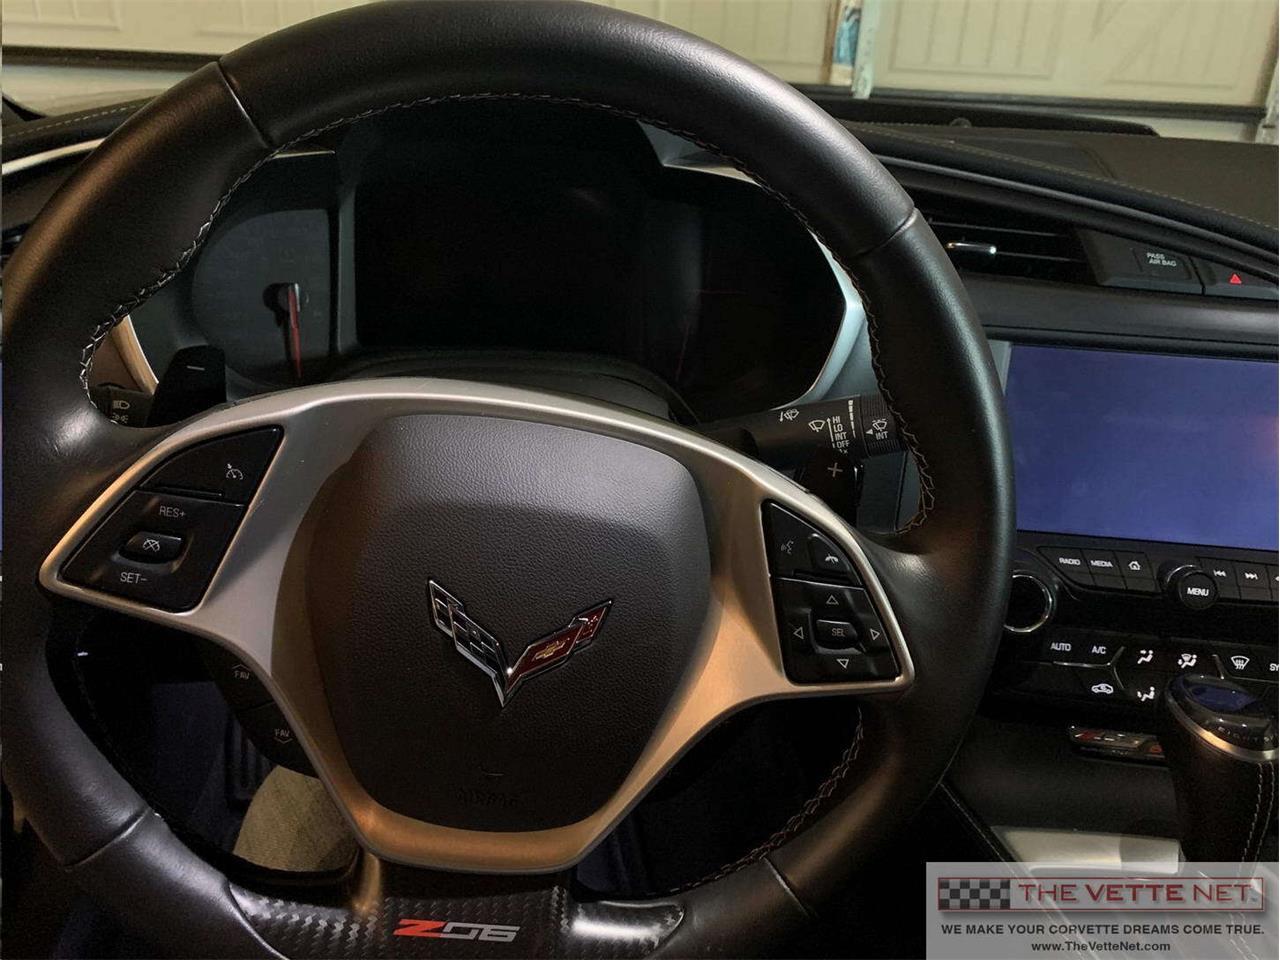 2018 Chevrolet Corvette (CC-1356421) for sale in Sarasota, Florida